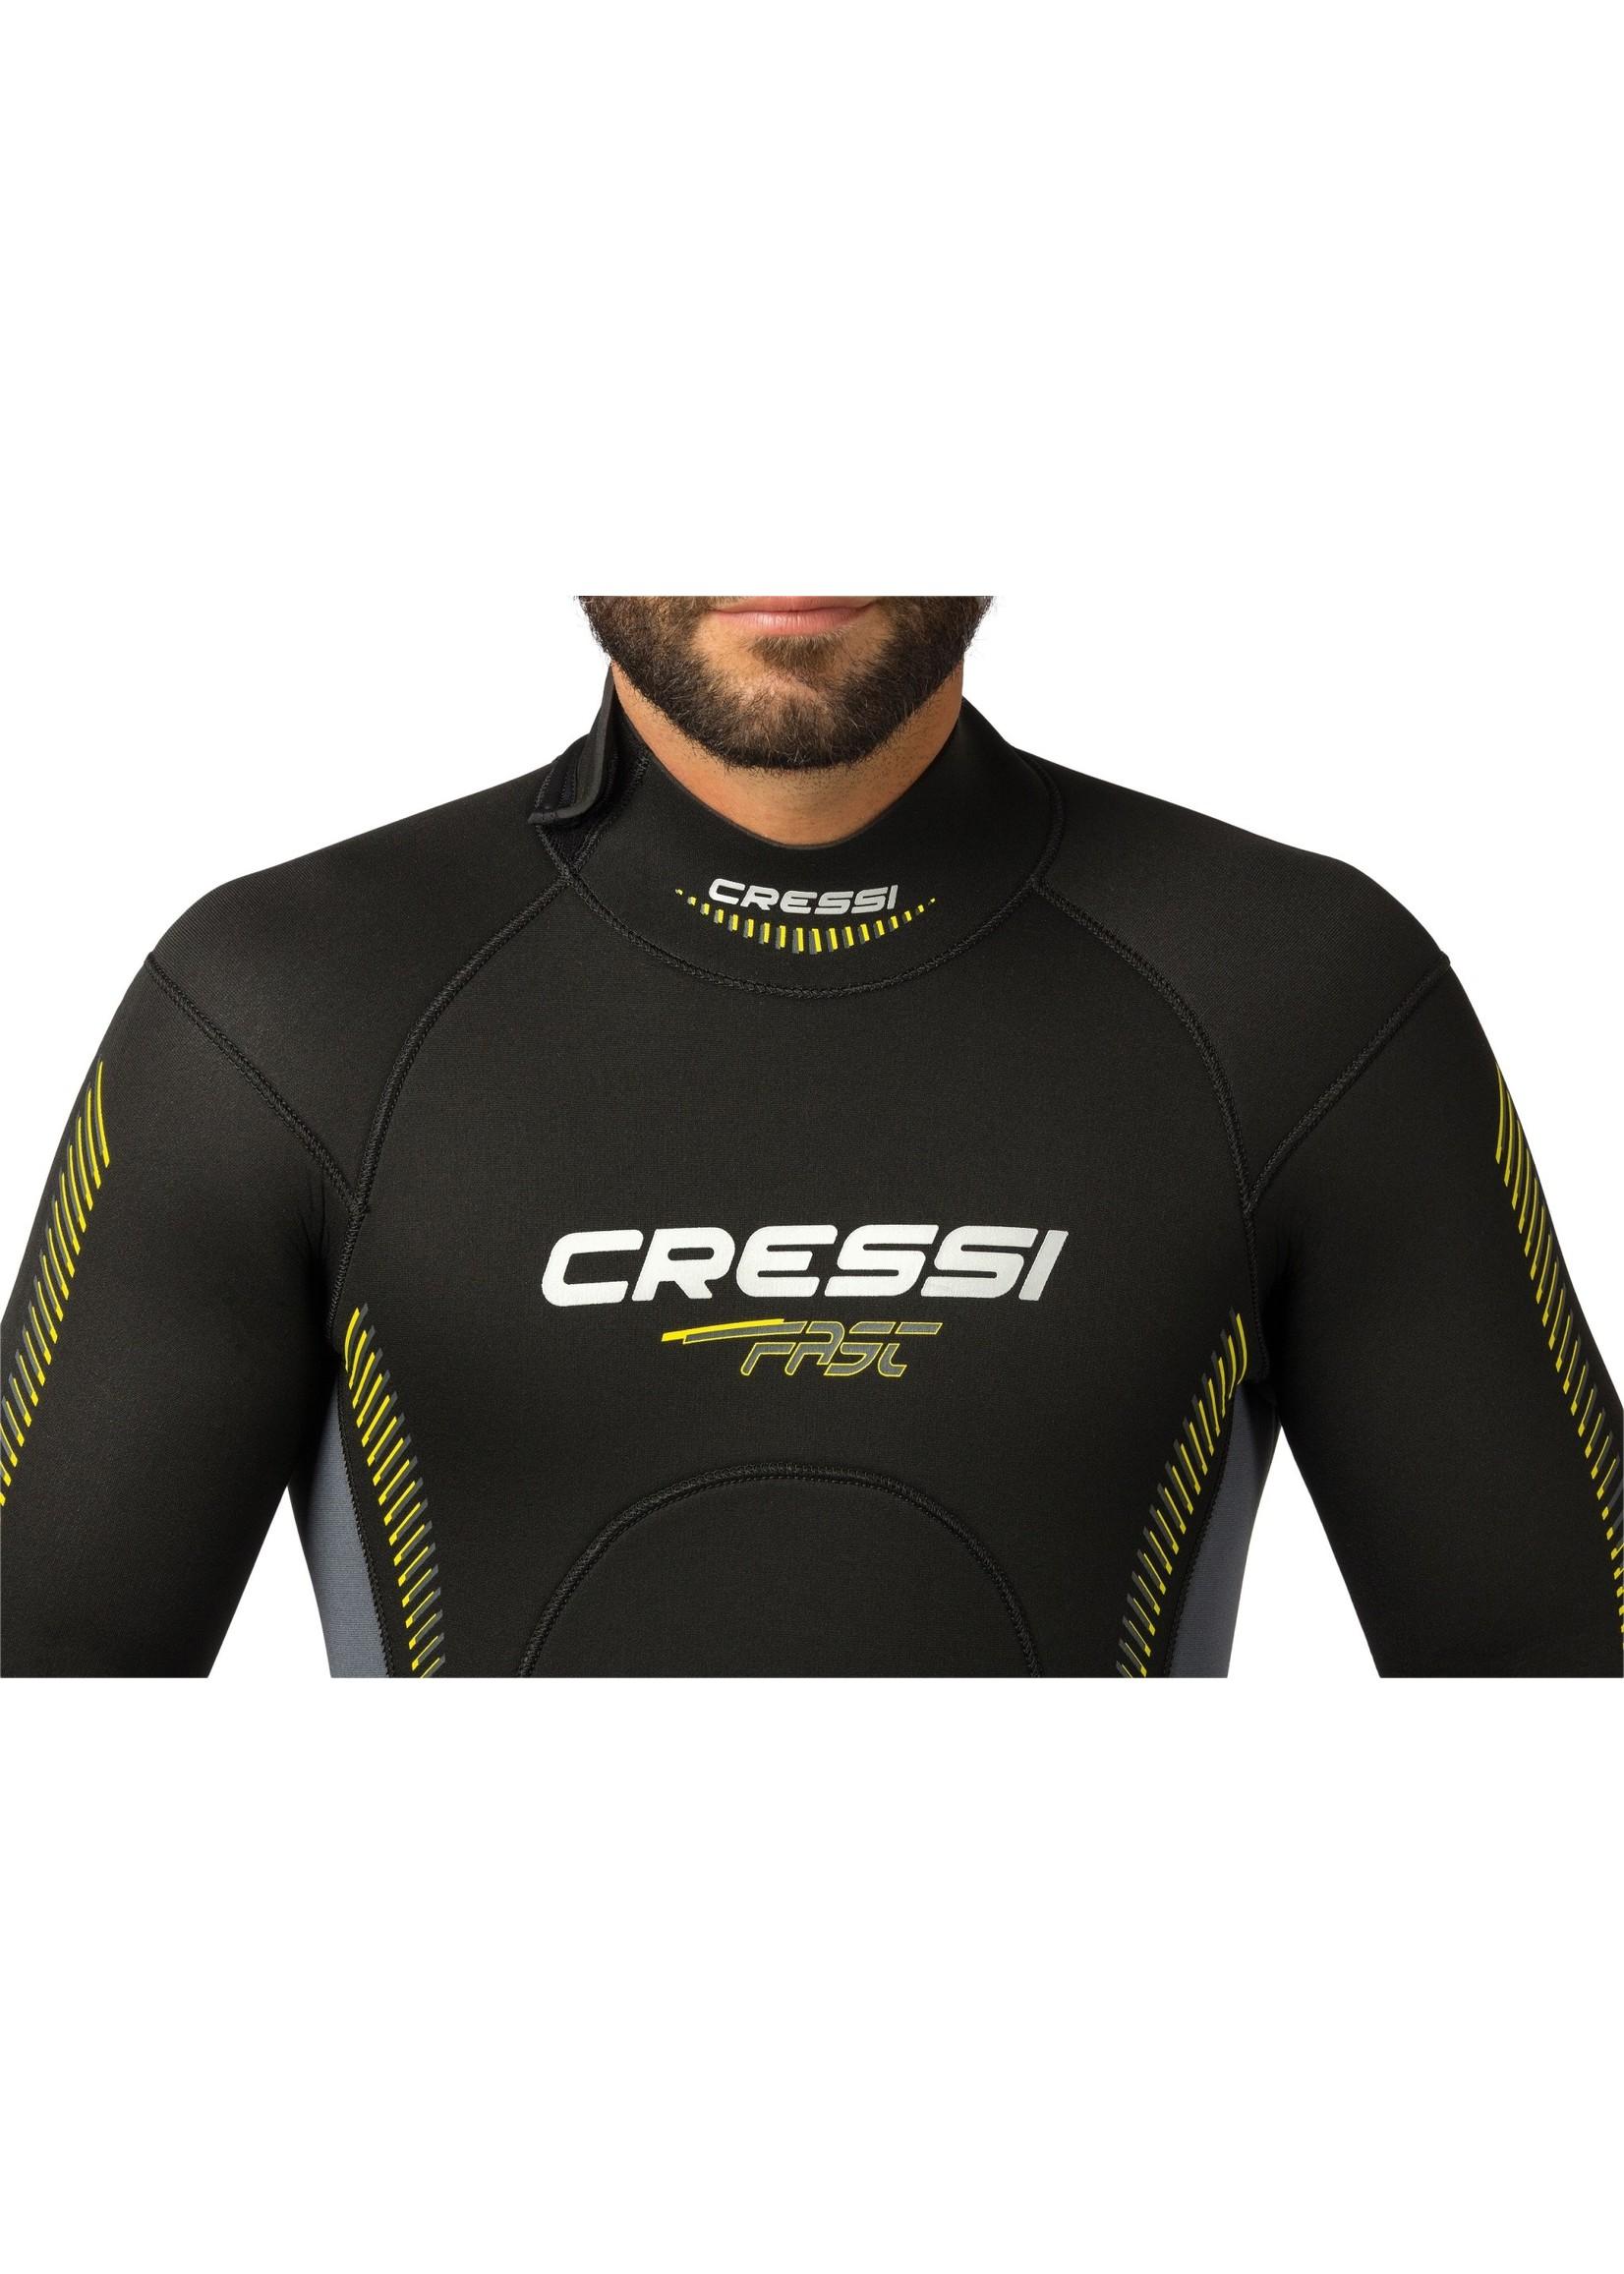 Cressi Cressi Fast All-in-One 5mm - man